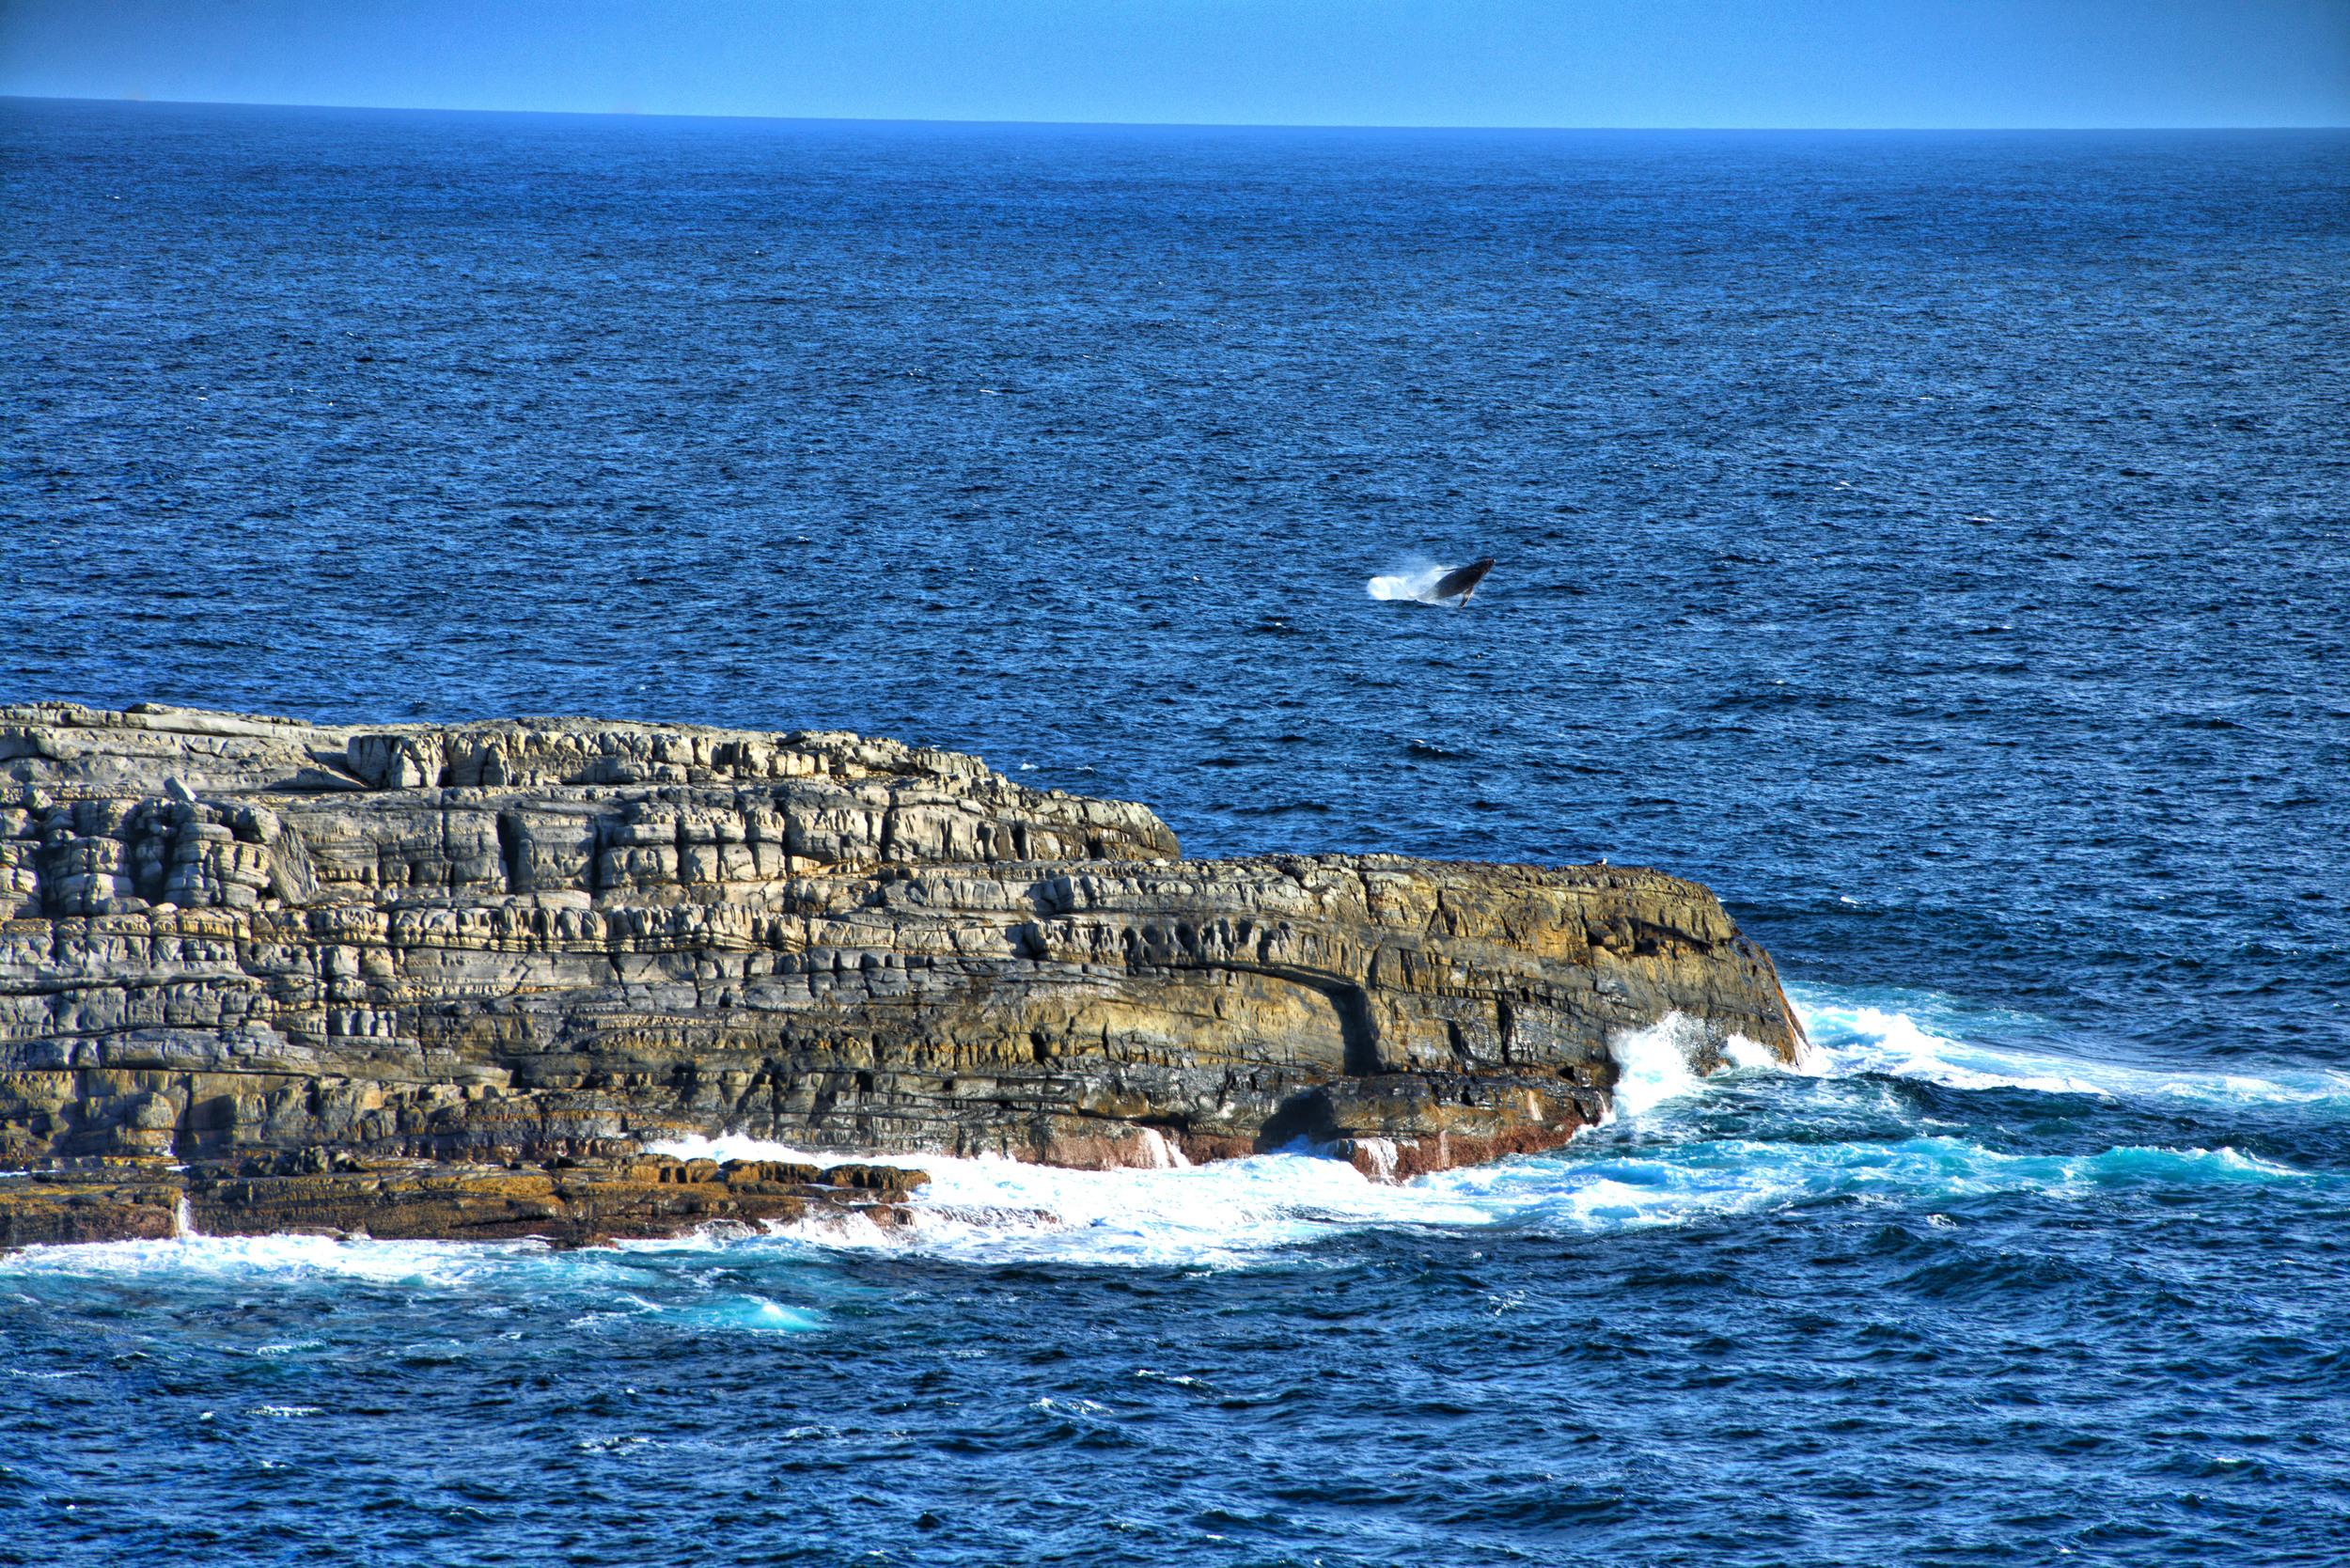 _CY12748 whale.jpg